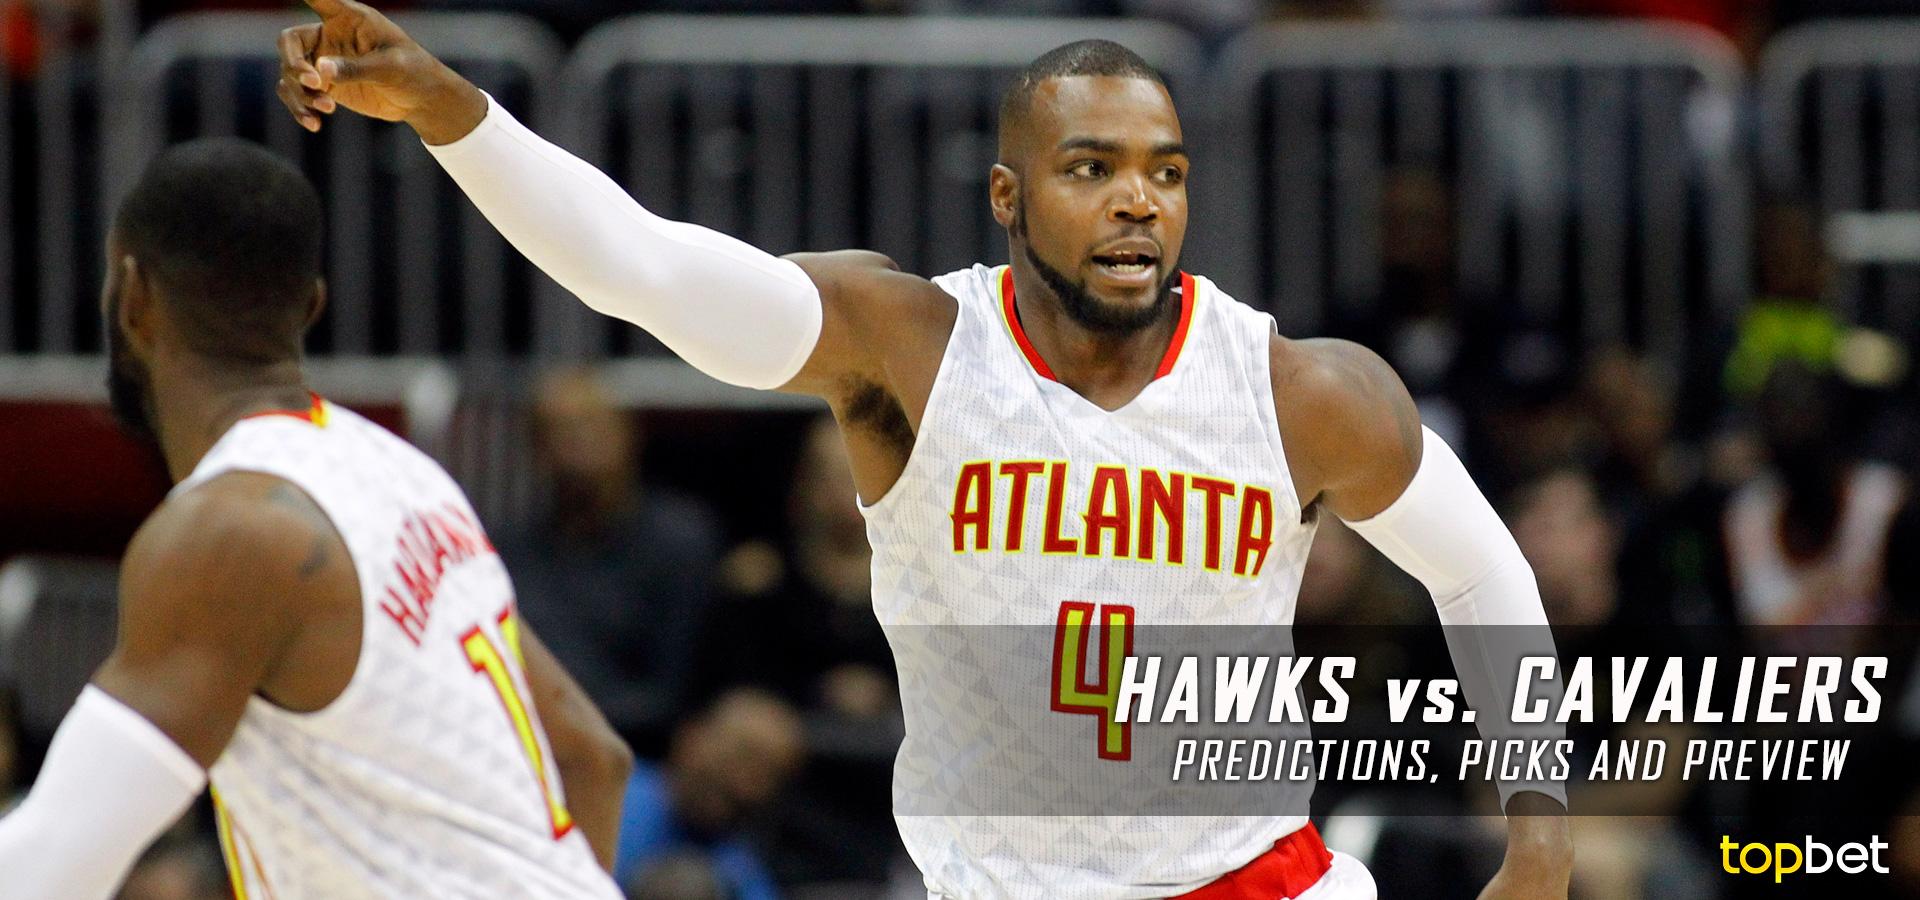 Cavaliers vs warriors game 7 predictions - Cavaliers Vs Warriors Game 7 Predictions 55